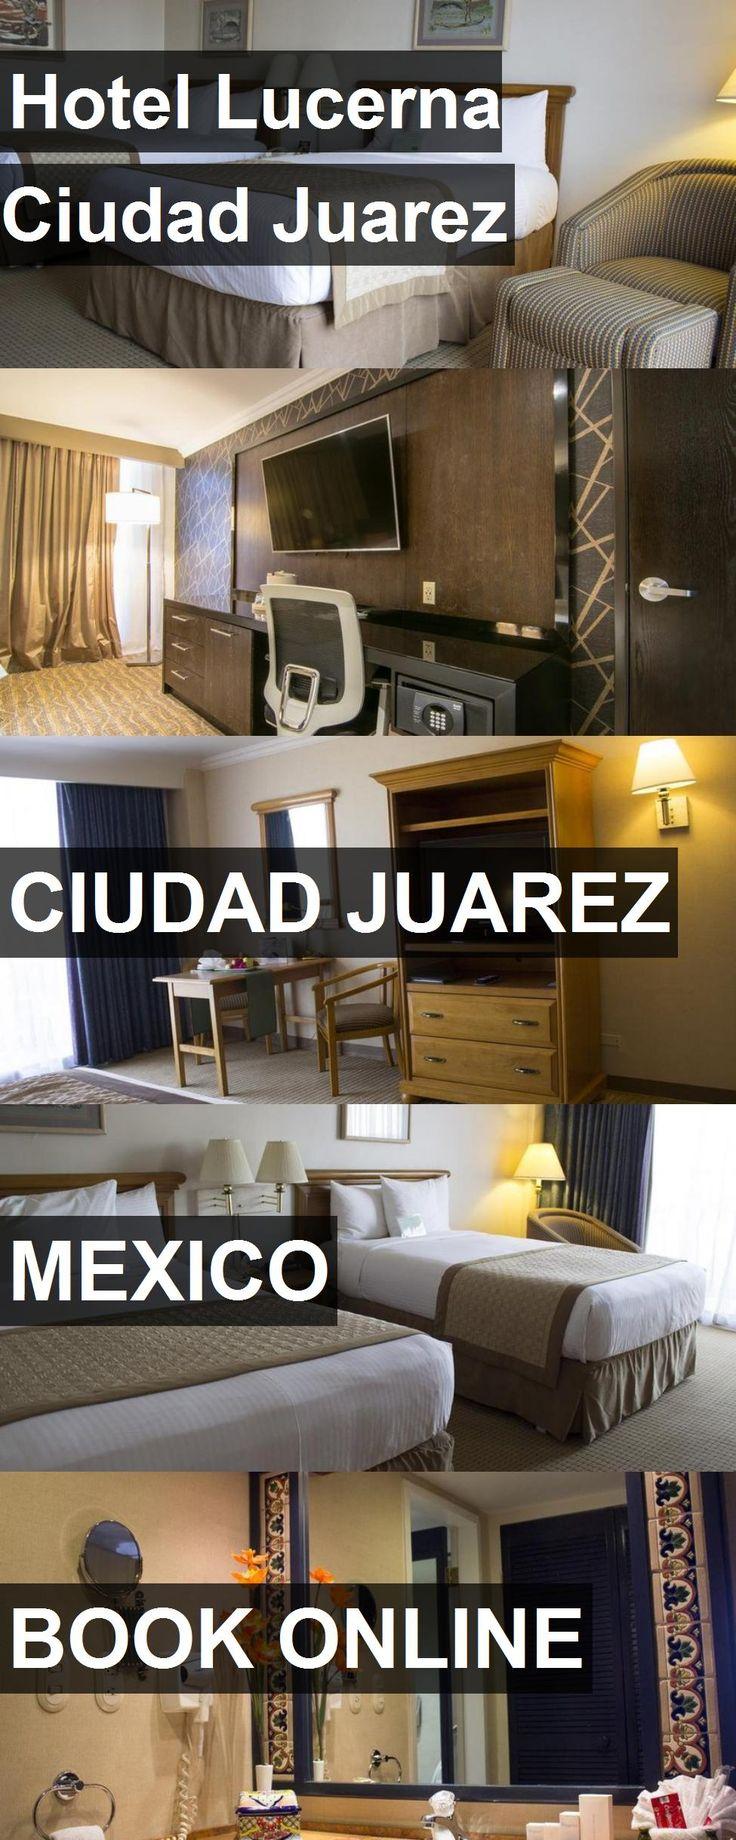 Hotel Lucerna Ciudad Juarez in Ciudad Juarez, Mexico. For more information, photos, reviews and best prices please follow the link. #Mexico #CiudadJuarez #travel #vacation #hotel